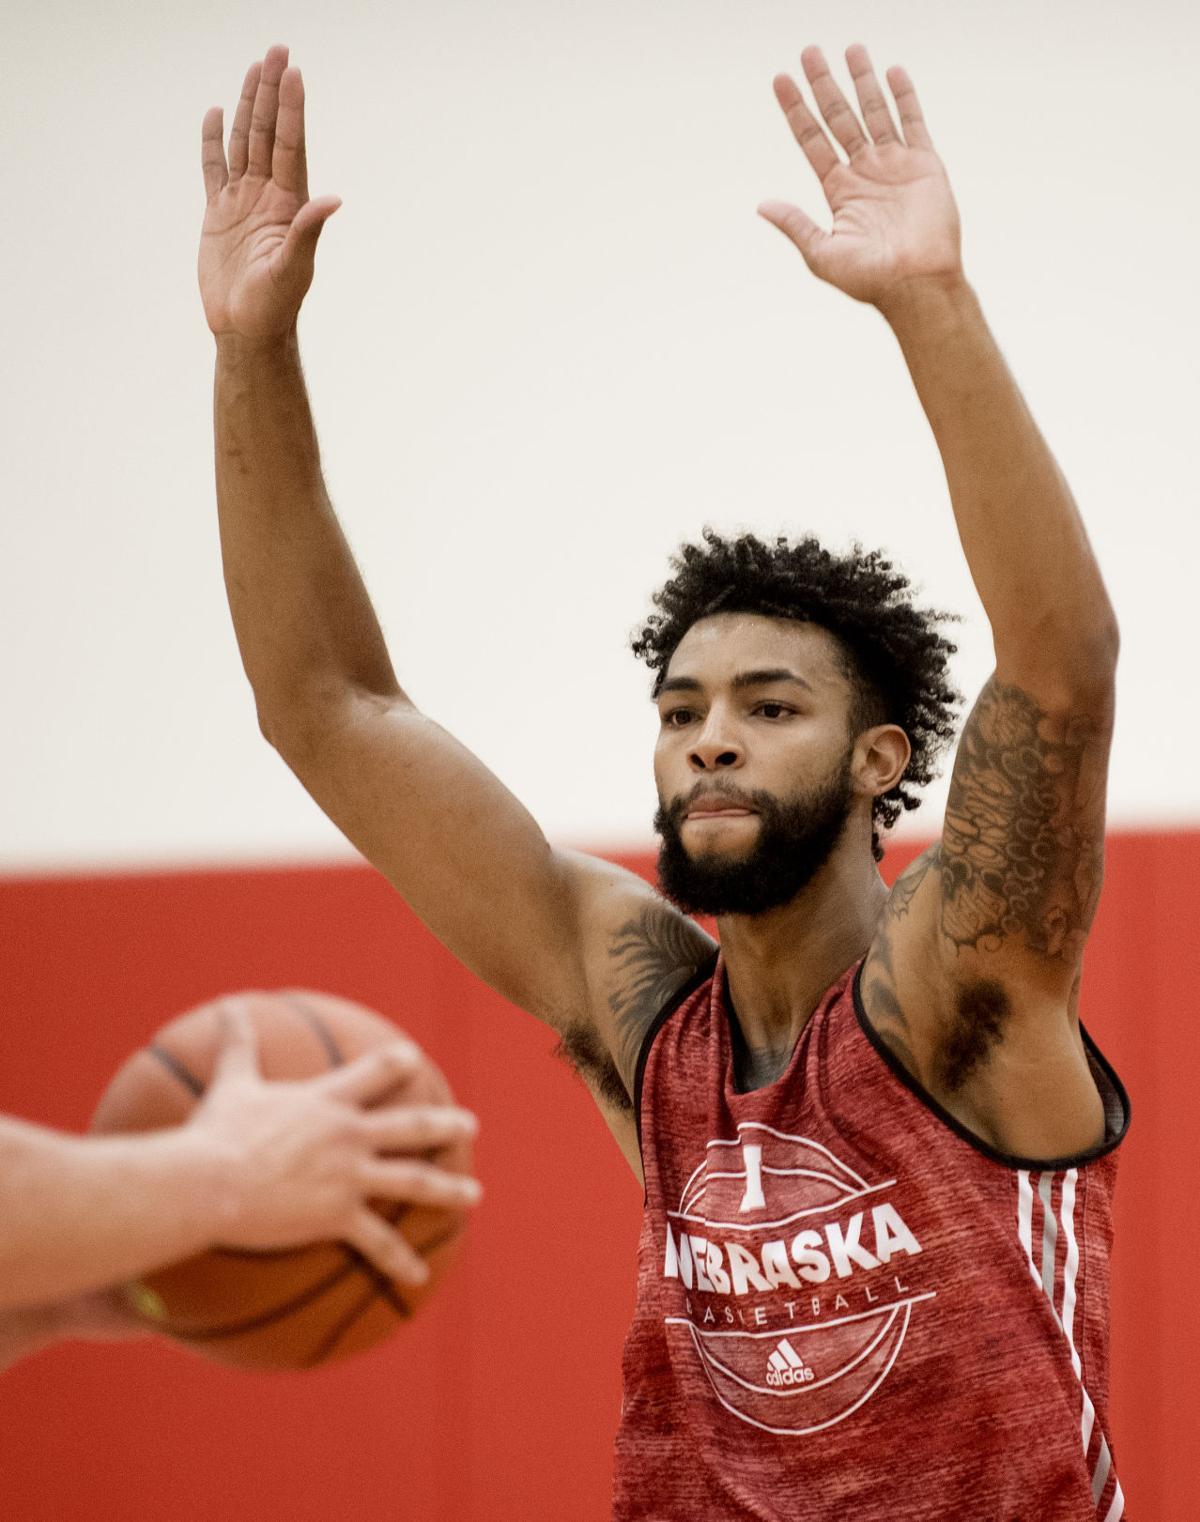 Nebraska men's basketball practice, 10/3/17